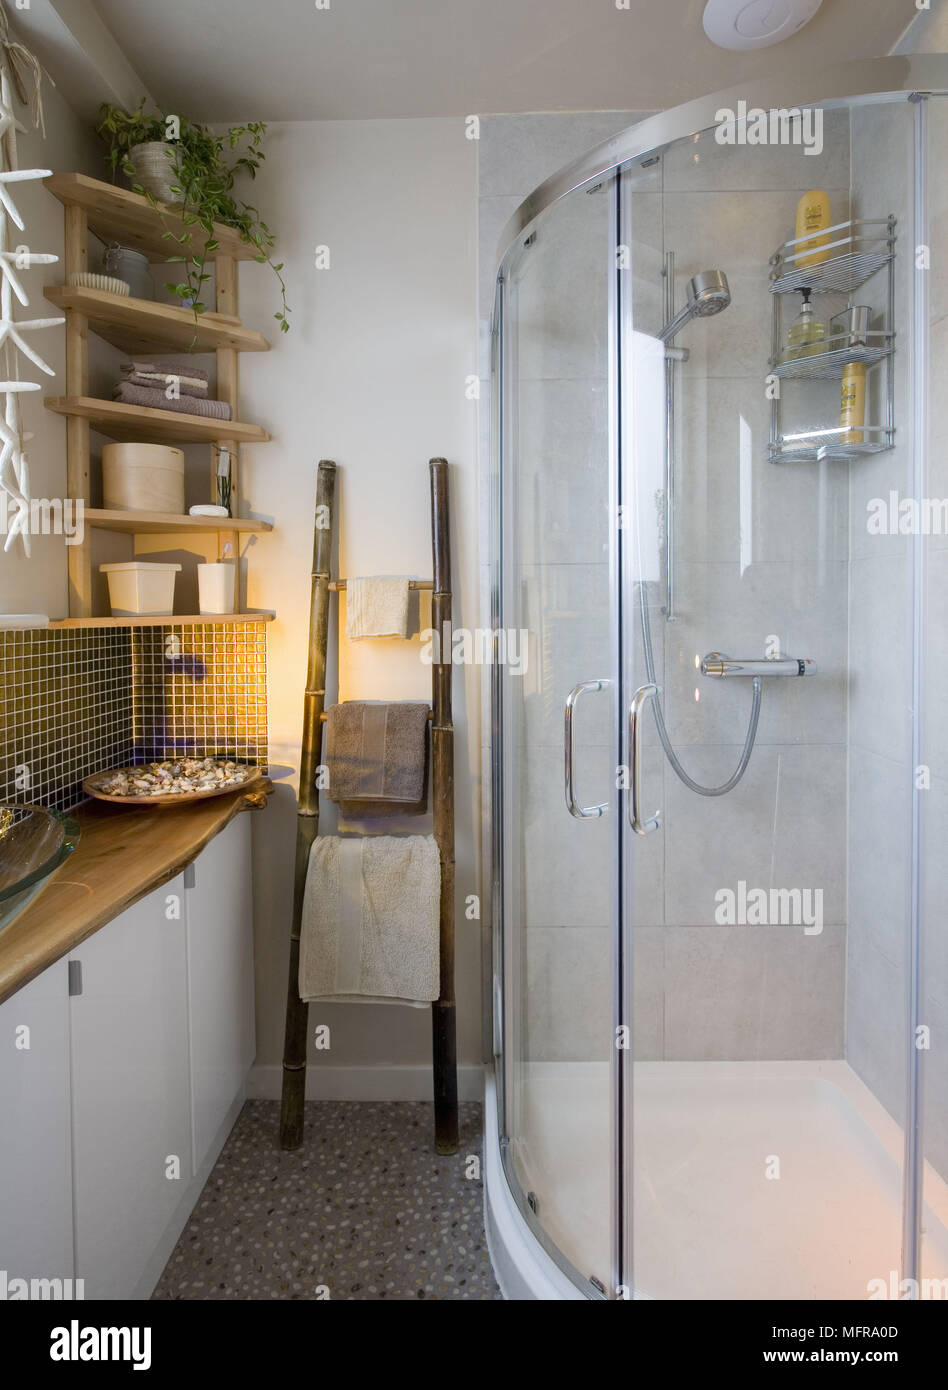 Modern shower cubicle set in corner of bathroom Stock Photo ...